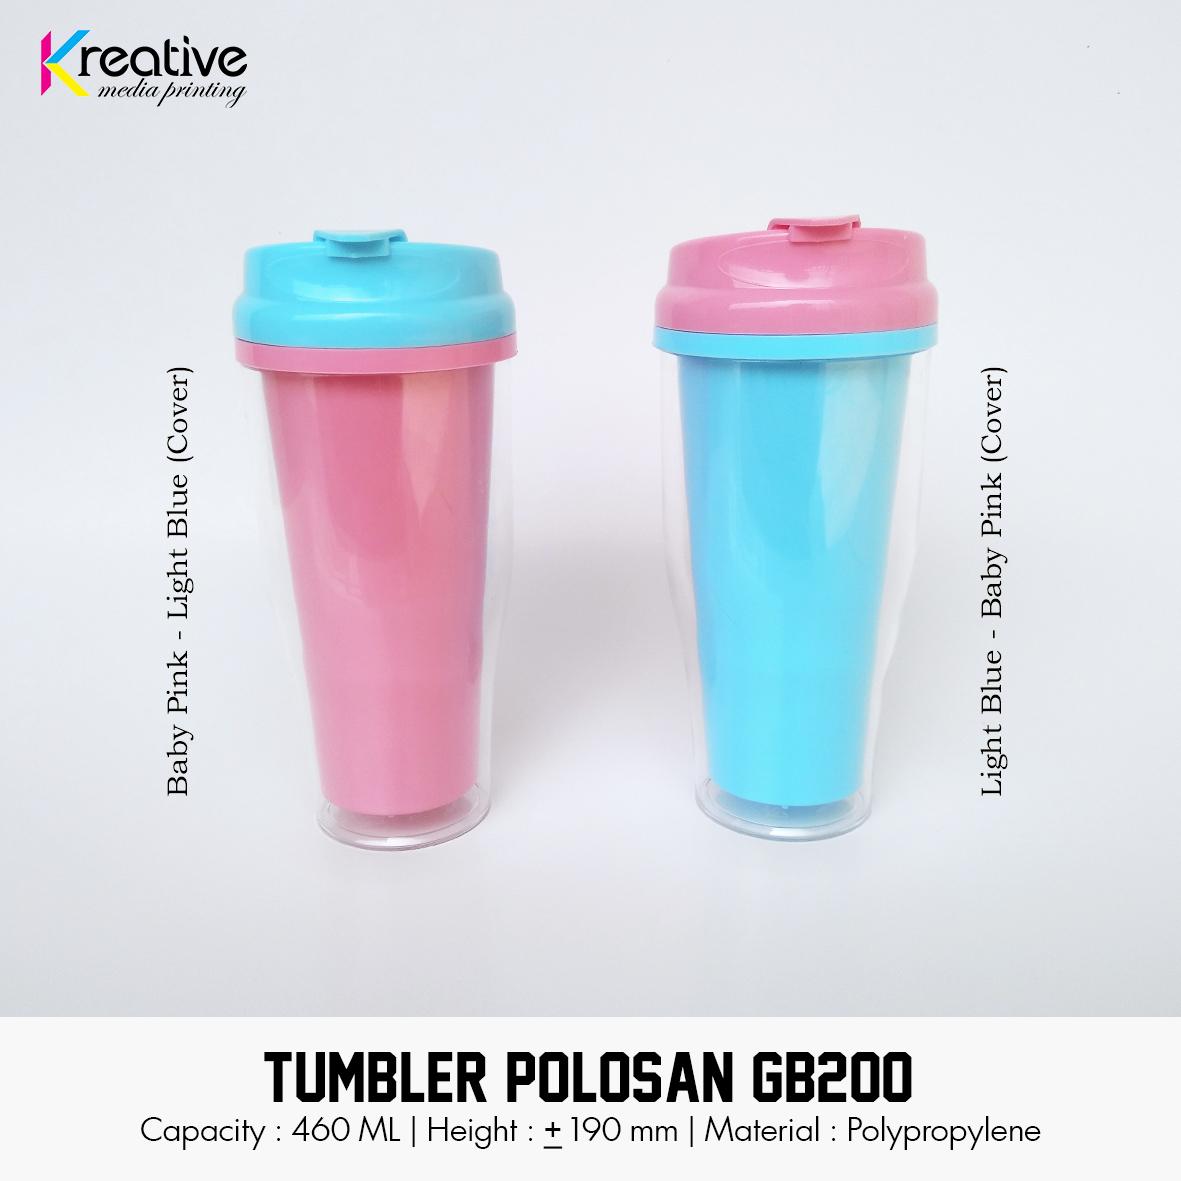 Tumbler Polosan GB200 Technoplast (3)